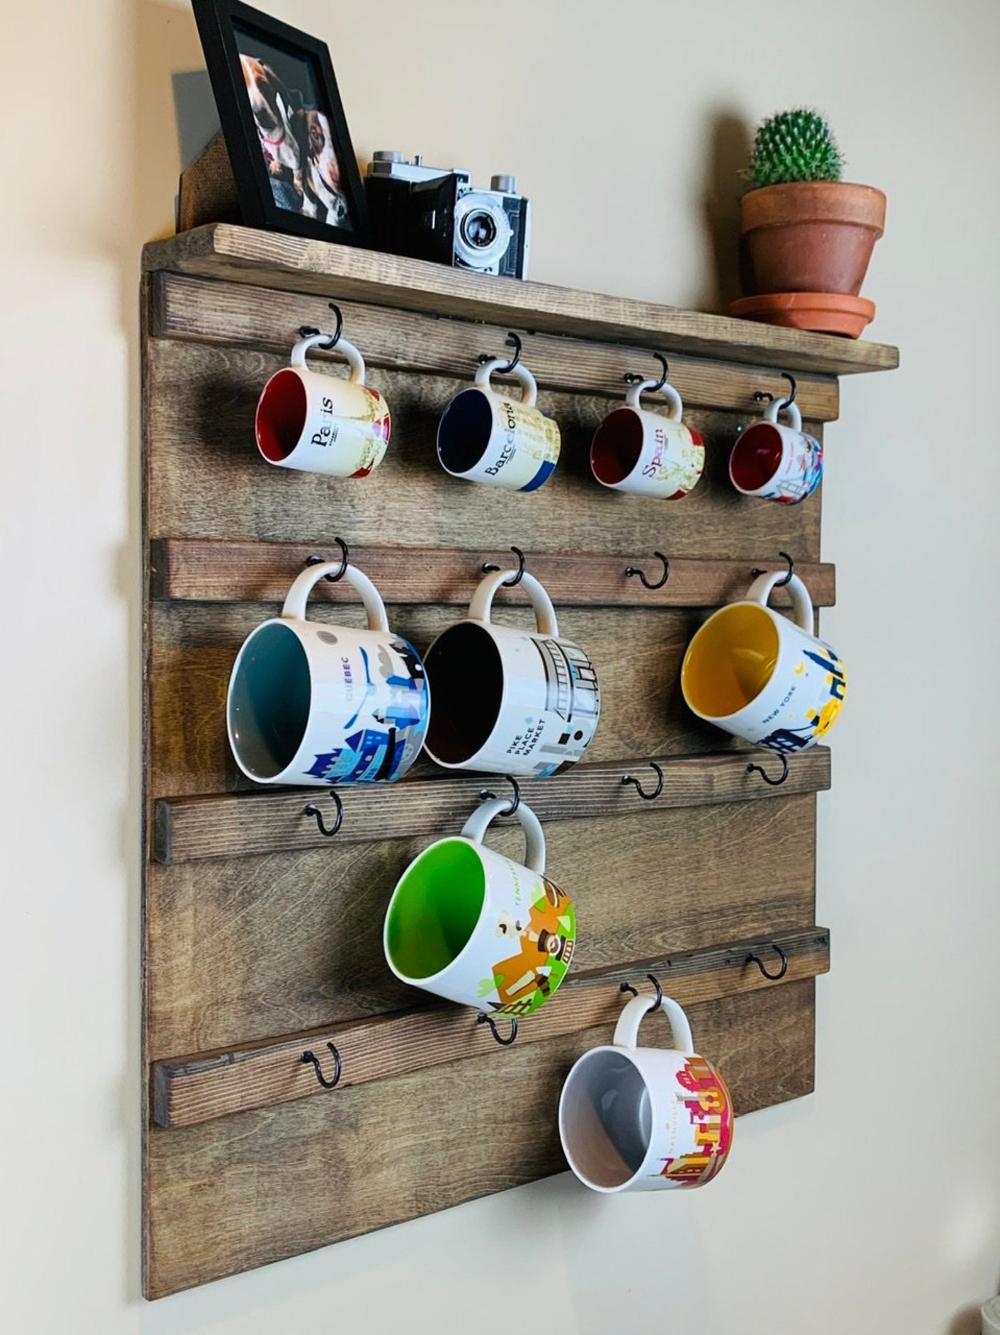 Coffee Mug Holder with Display Shelf, Wall Mounted Coffee